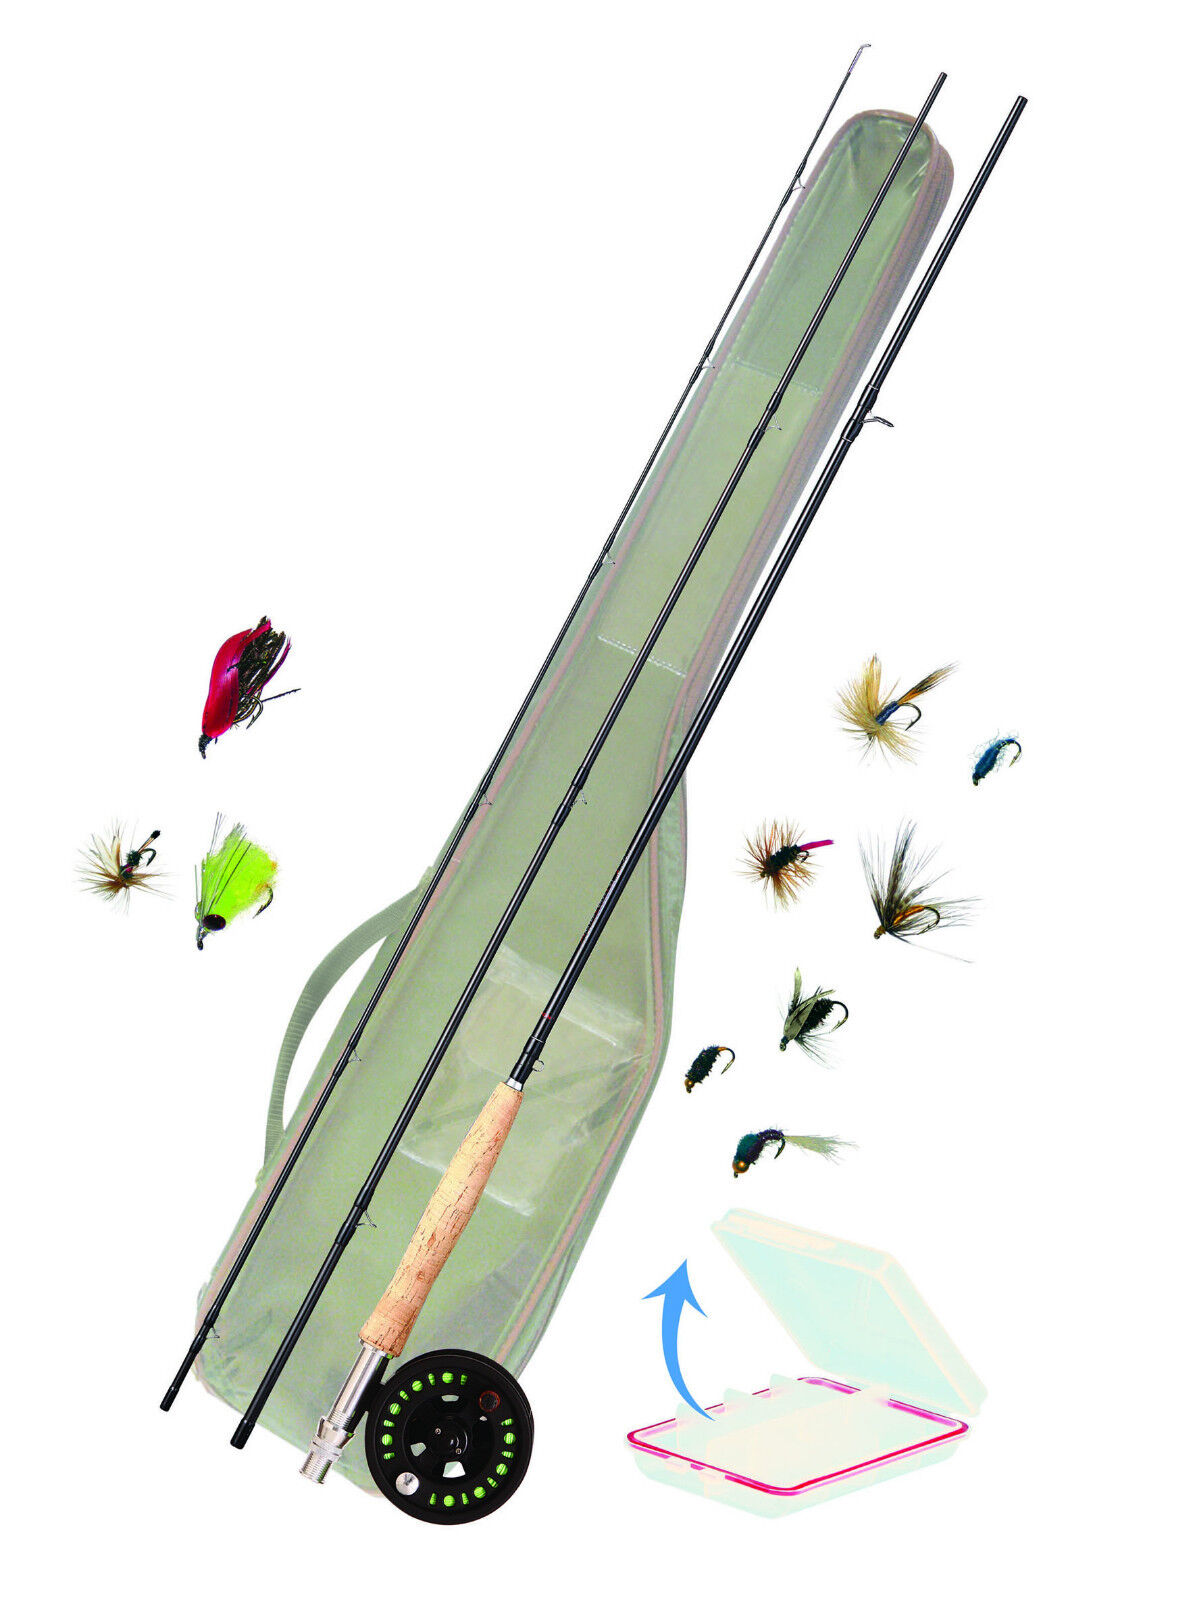 Fliegenfischen Fliegen-Komplettset Fliegen-Komplettset Fliegen-Komplettset AFTMA 6/7  Deluxe mit Großkernfliegenrolle fab3fa